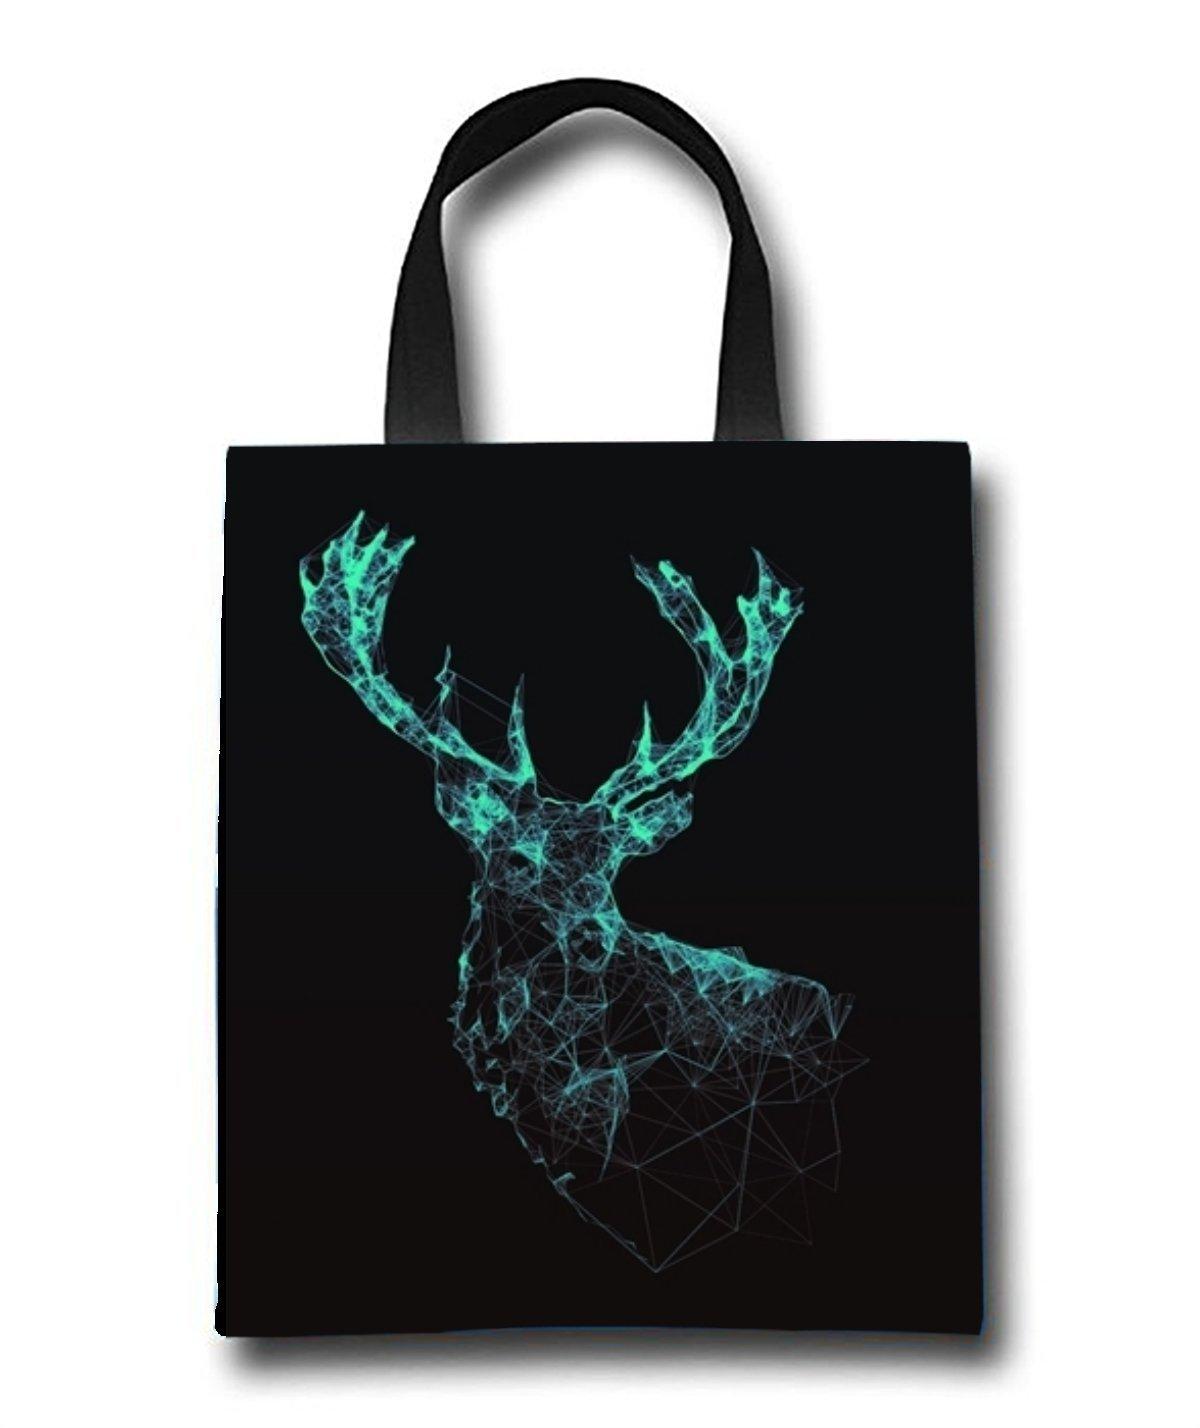 Deer Art Beach Tote Bag - Toy Tote Bag - Large Lightweight Market, Grocery & Picnic